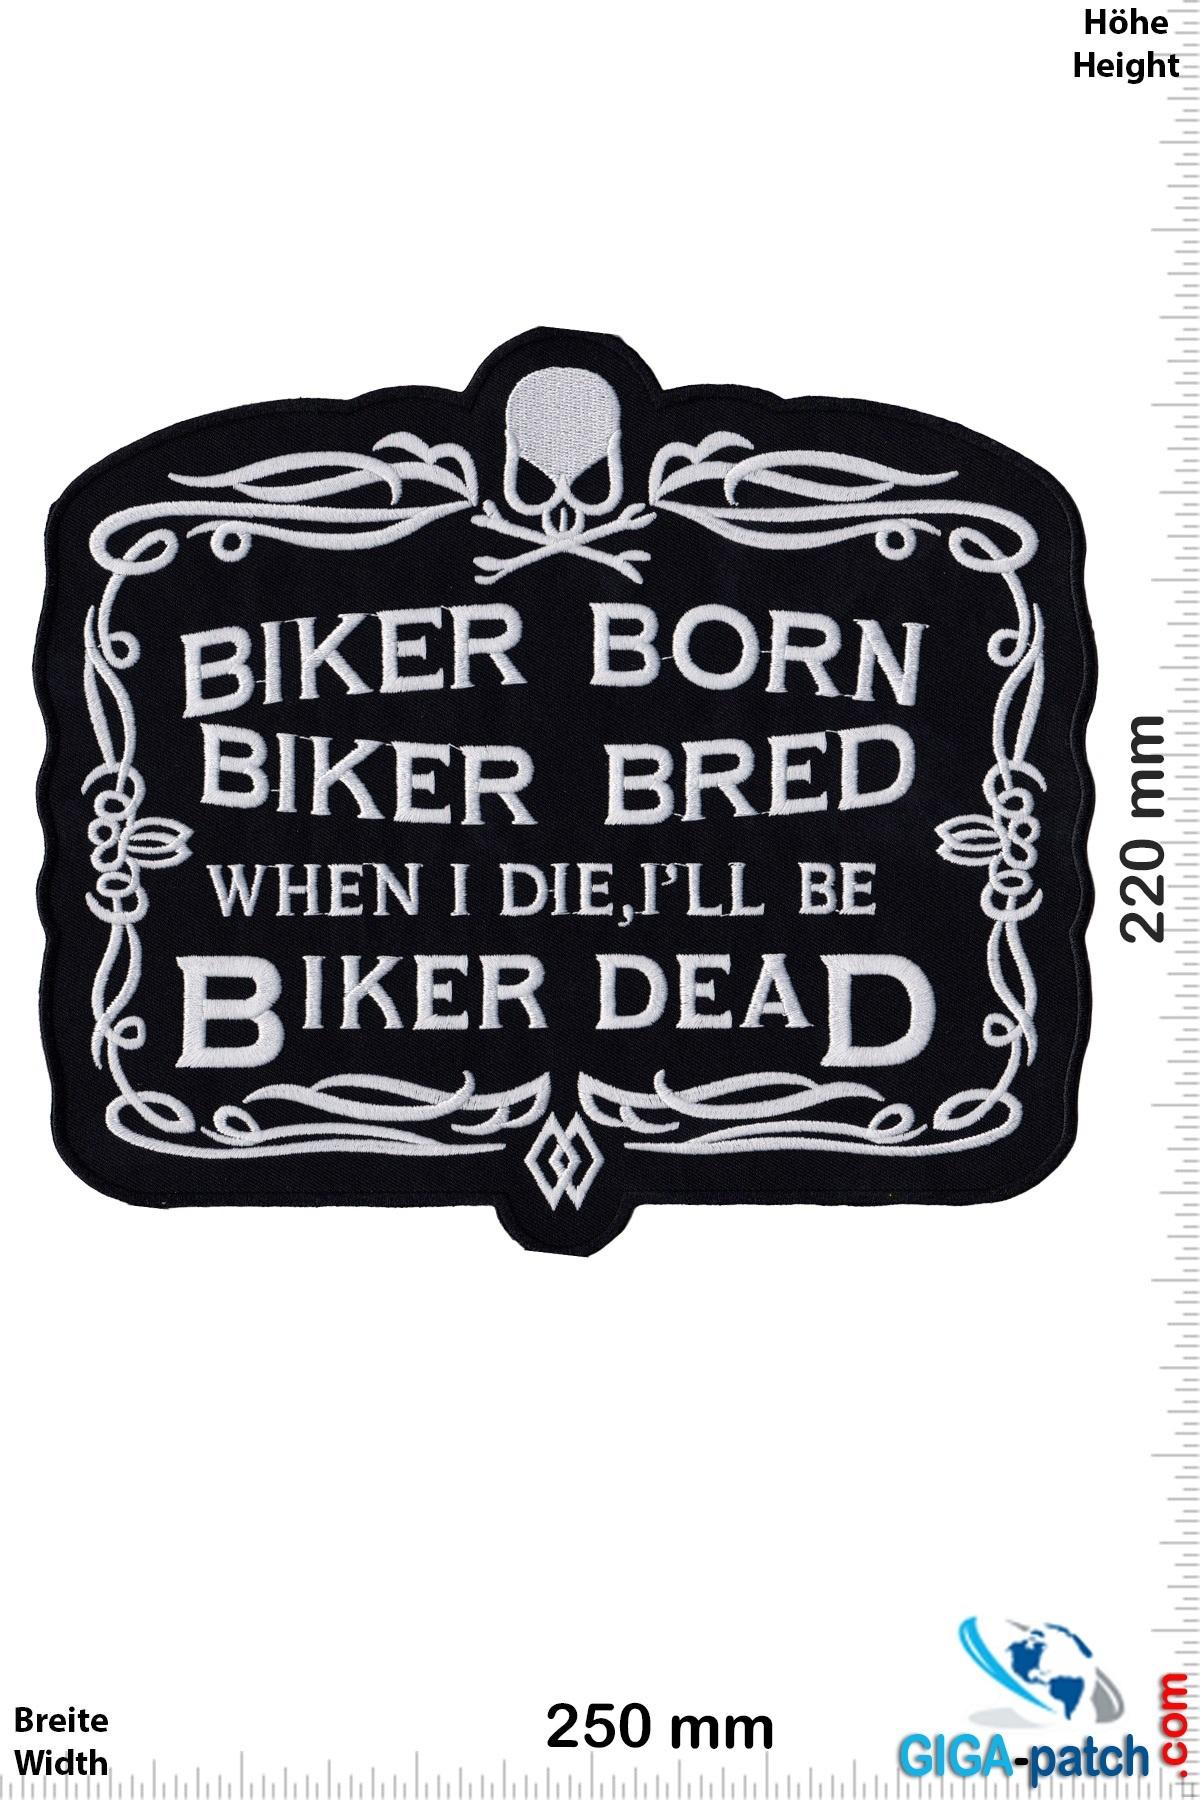 Biker Biker Born Biker Bred When i die, i'll be Biker Dead - 25 cm